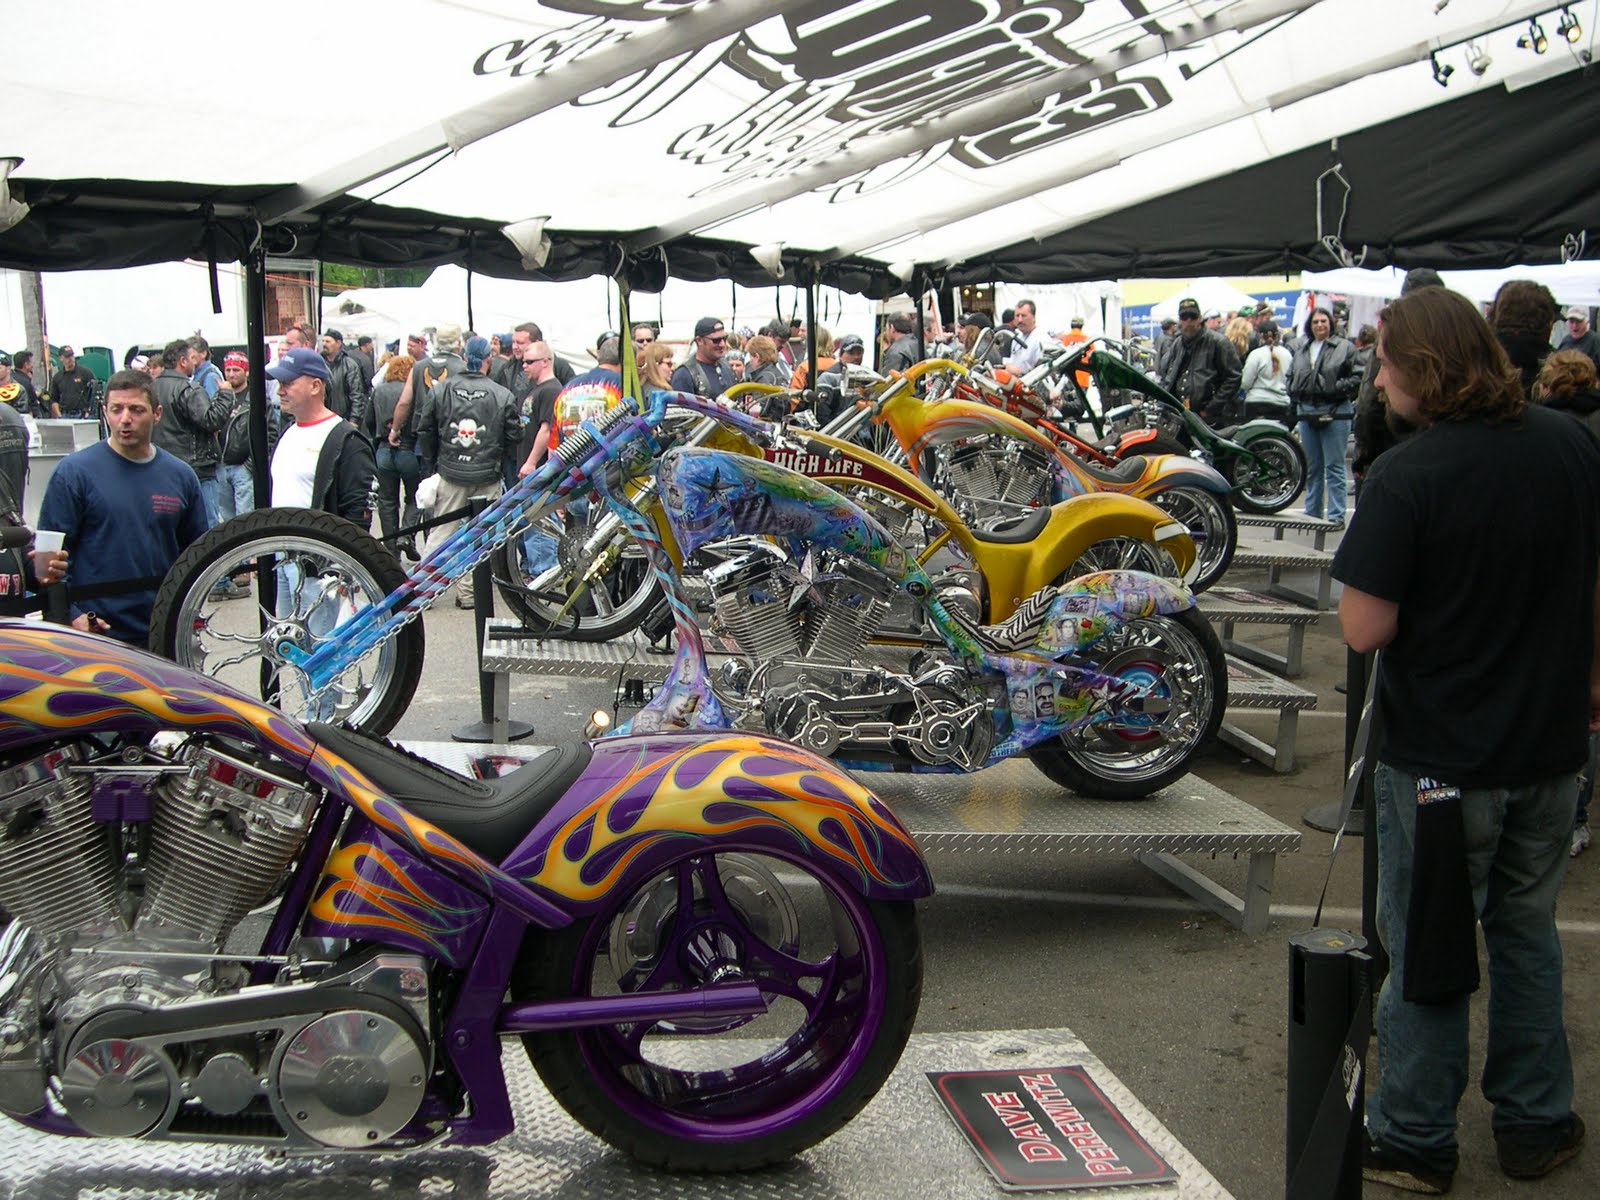 Panama City Beach Bike Fest